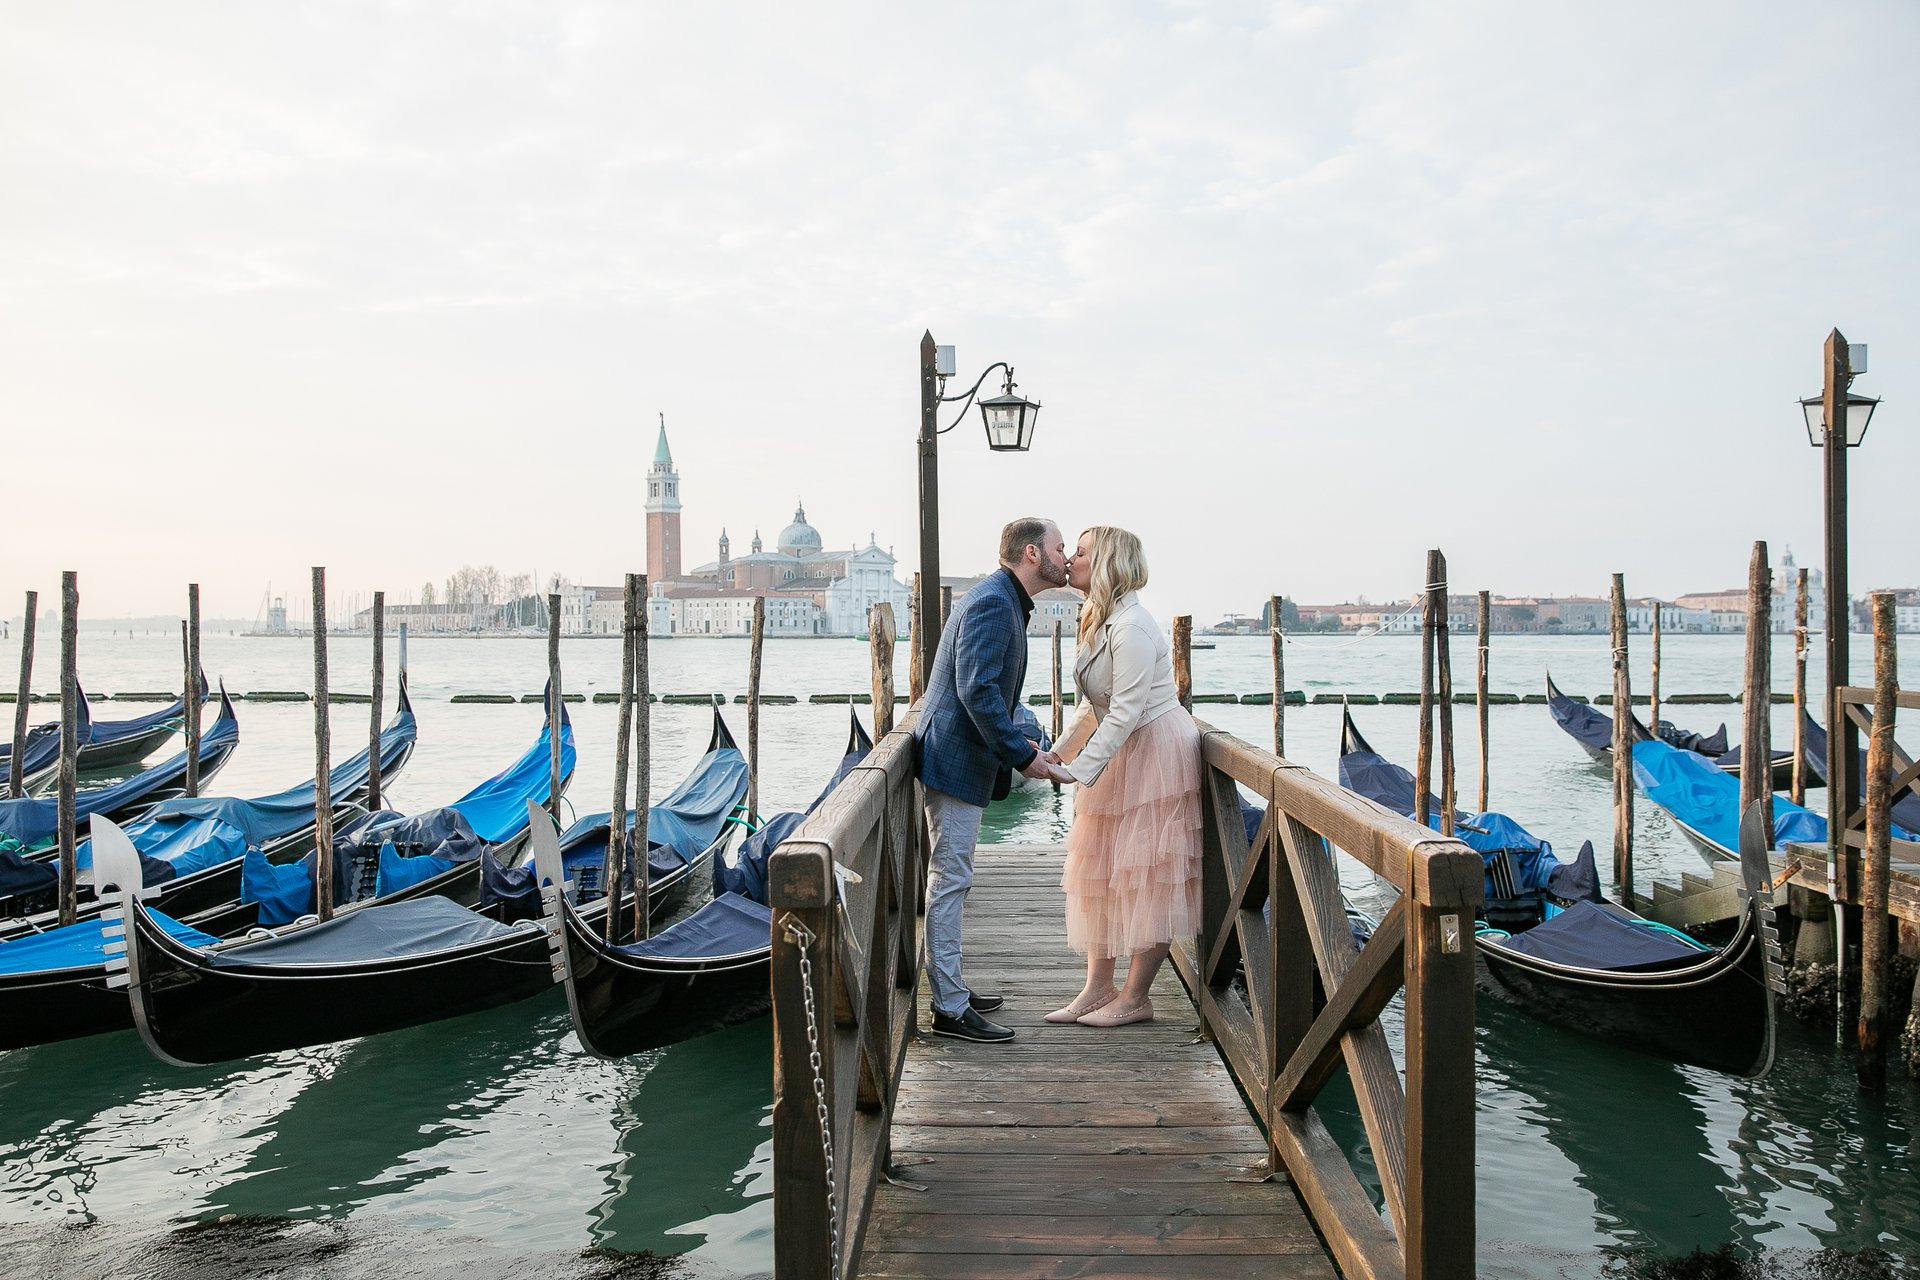 Venice-Italy-travel-story-Flytographer-6